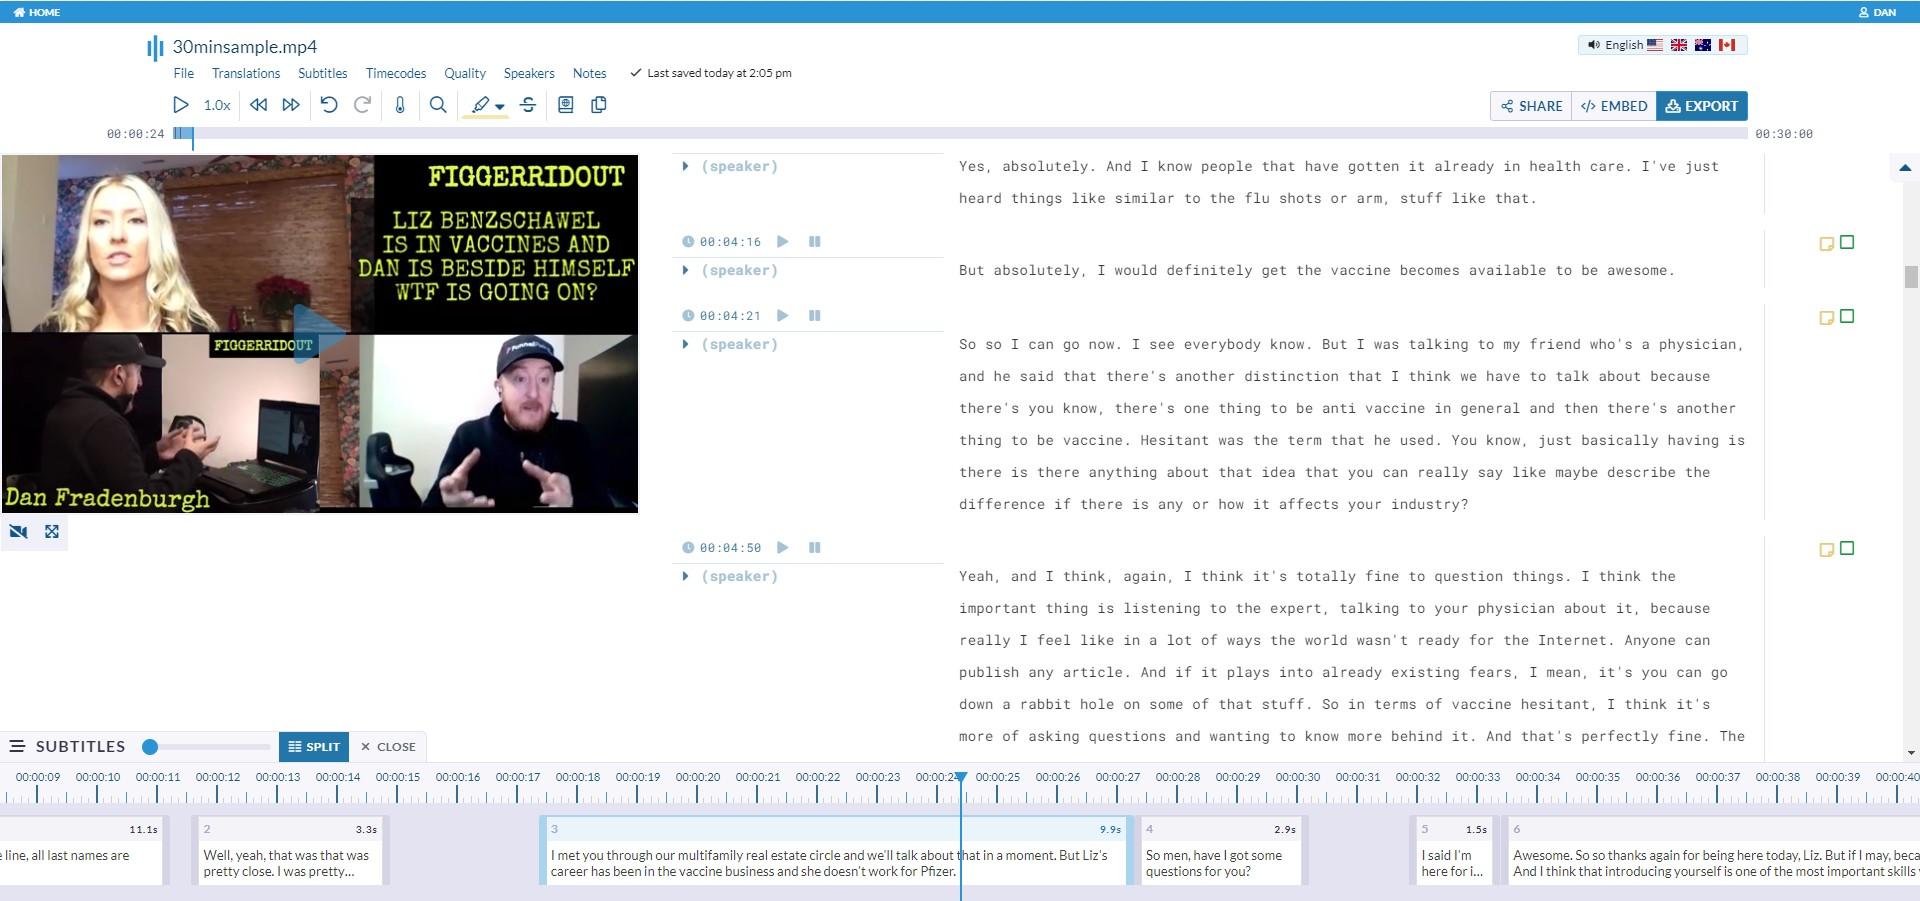 sonix-screenshot